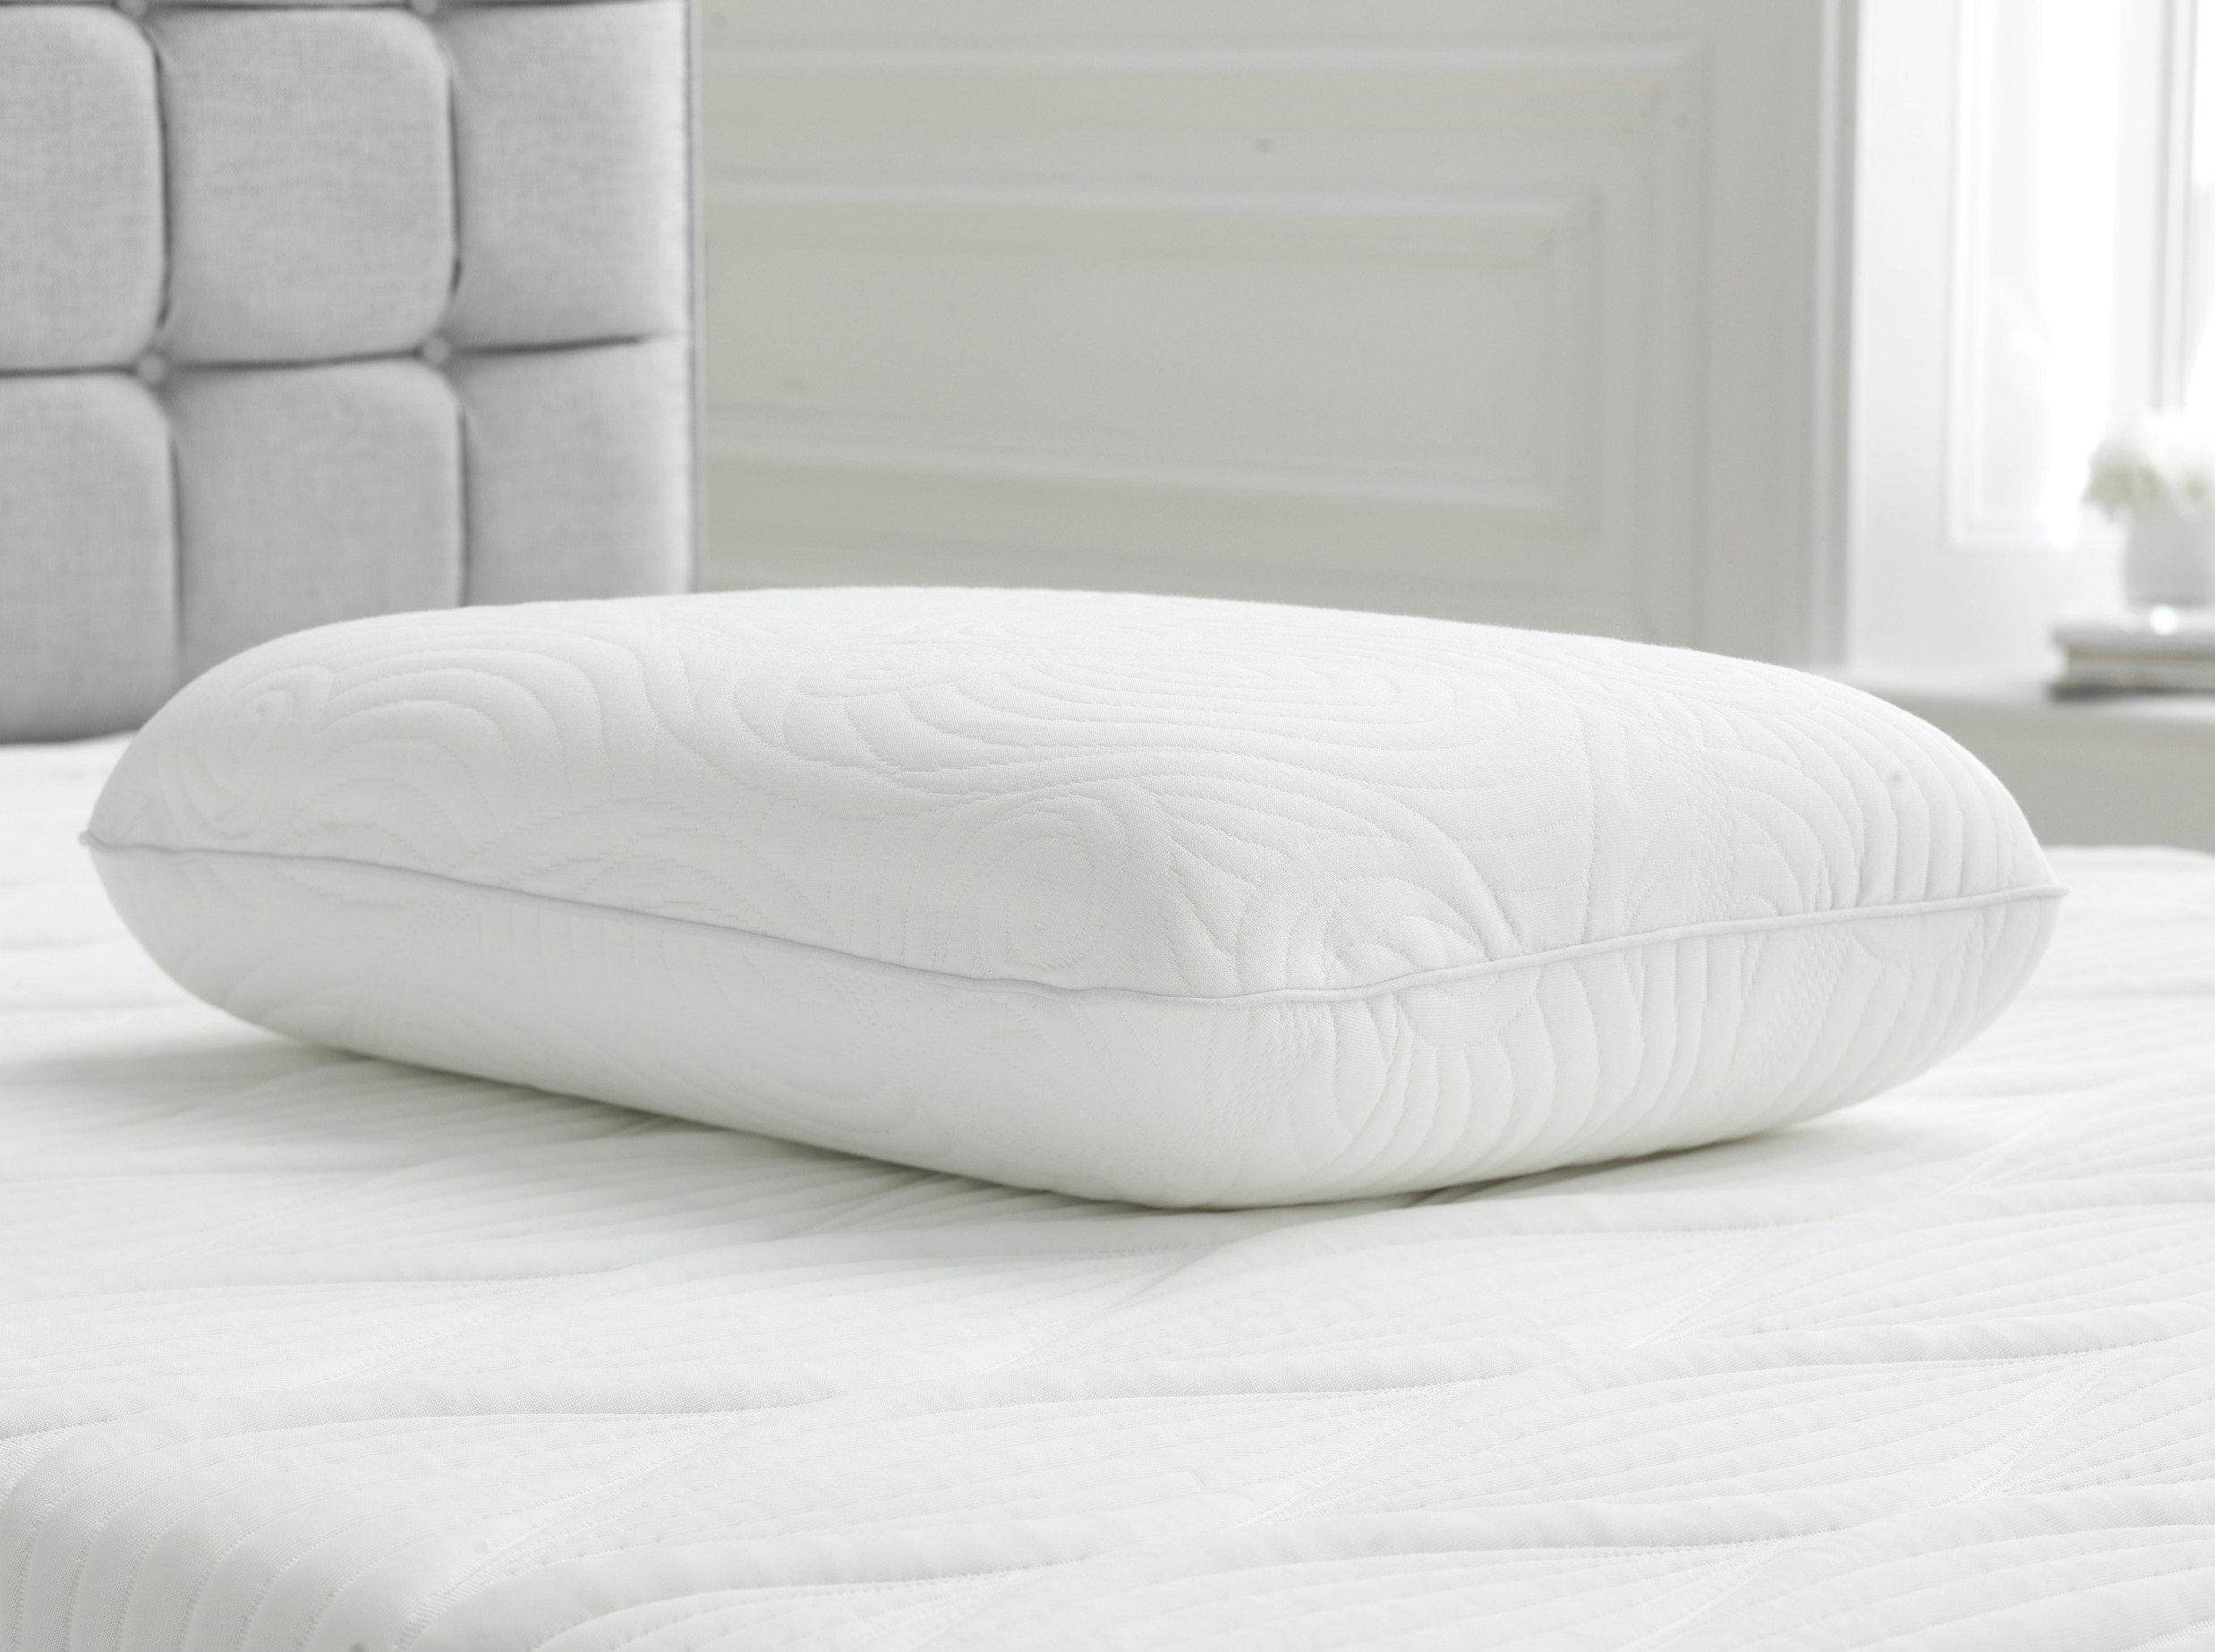 Image of Dormeo Octaspring Memory Foam Pillow